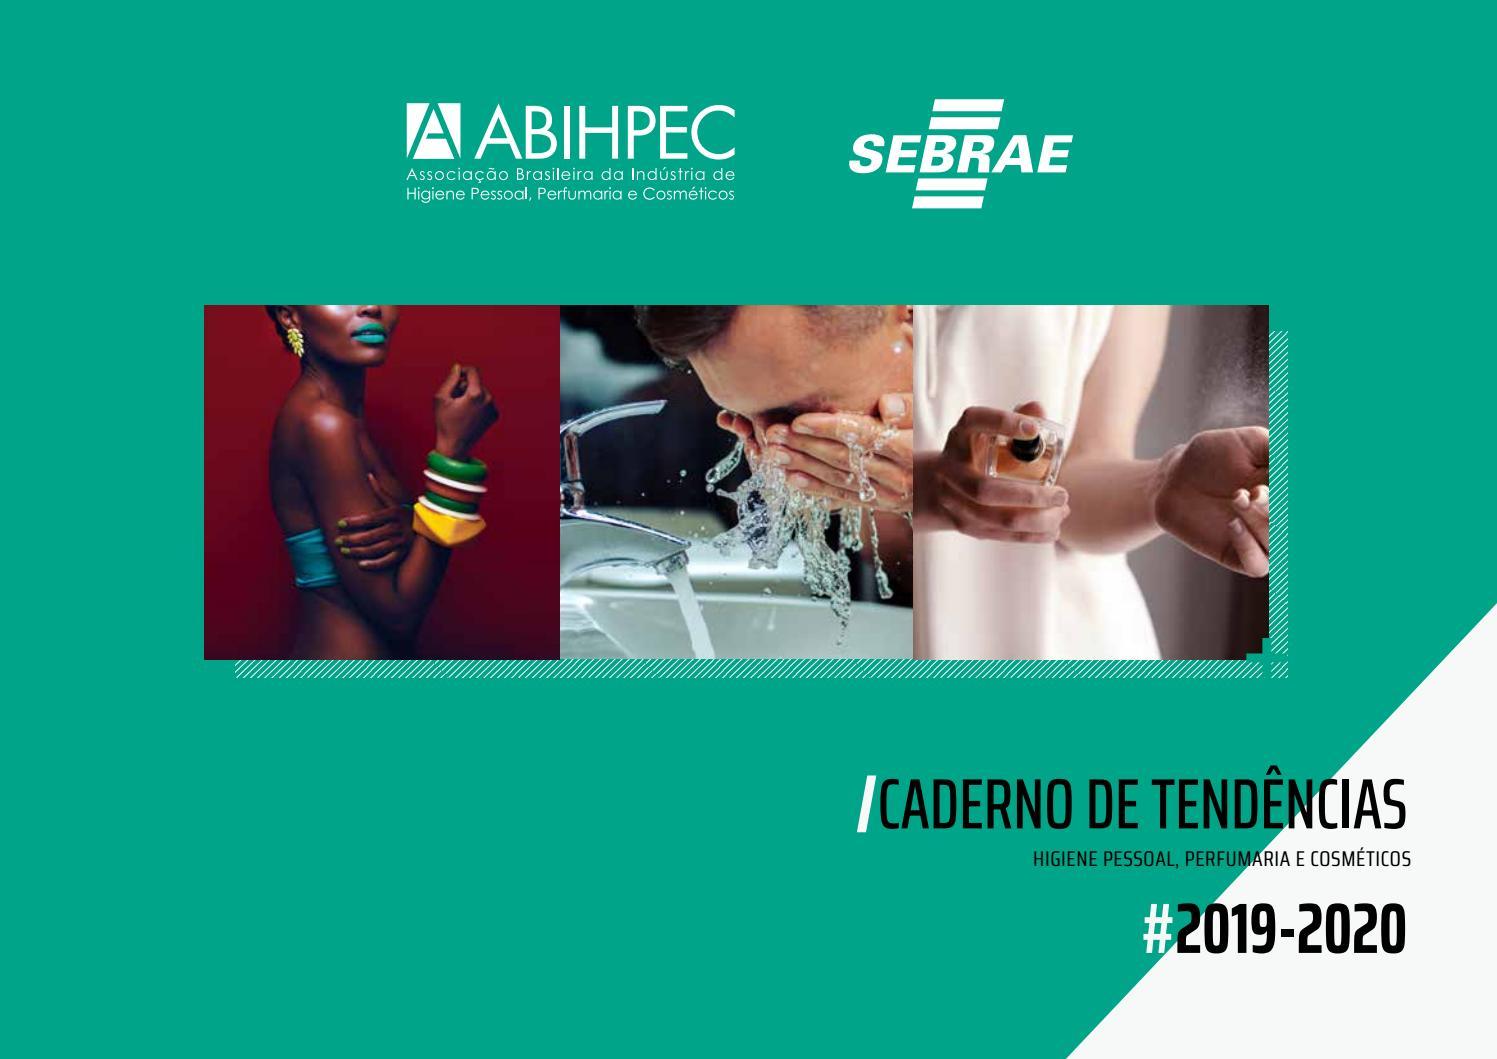 Caderno de Tendências HPPC 2019 2020 - ABIHPEC e Sebrae by ABIHPEC - issuu b5e18f2cb5